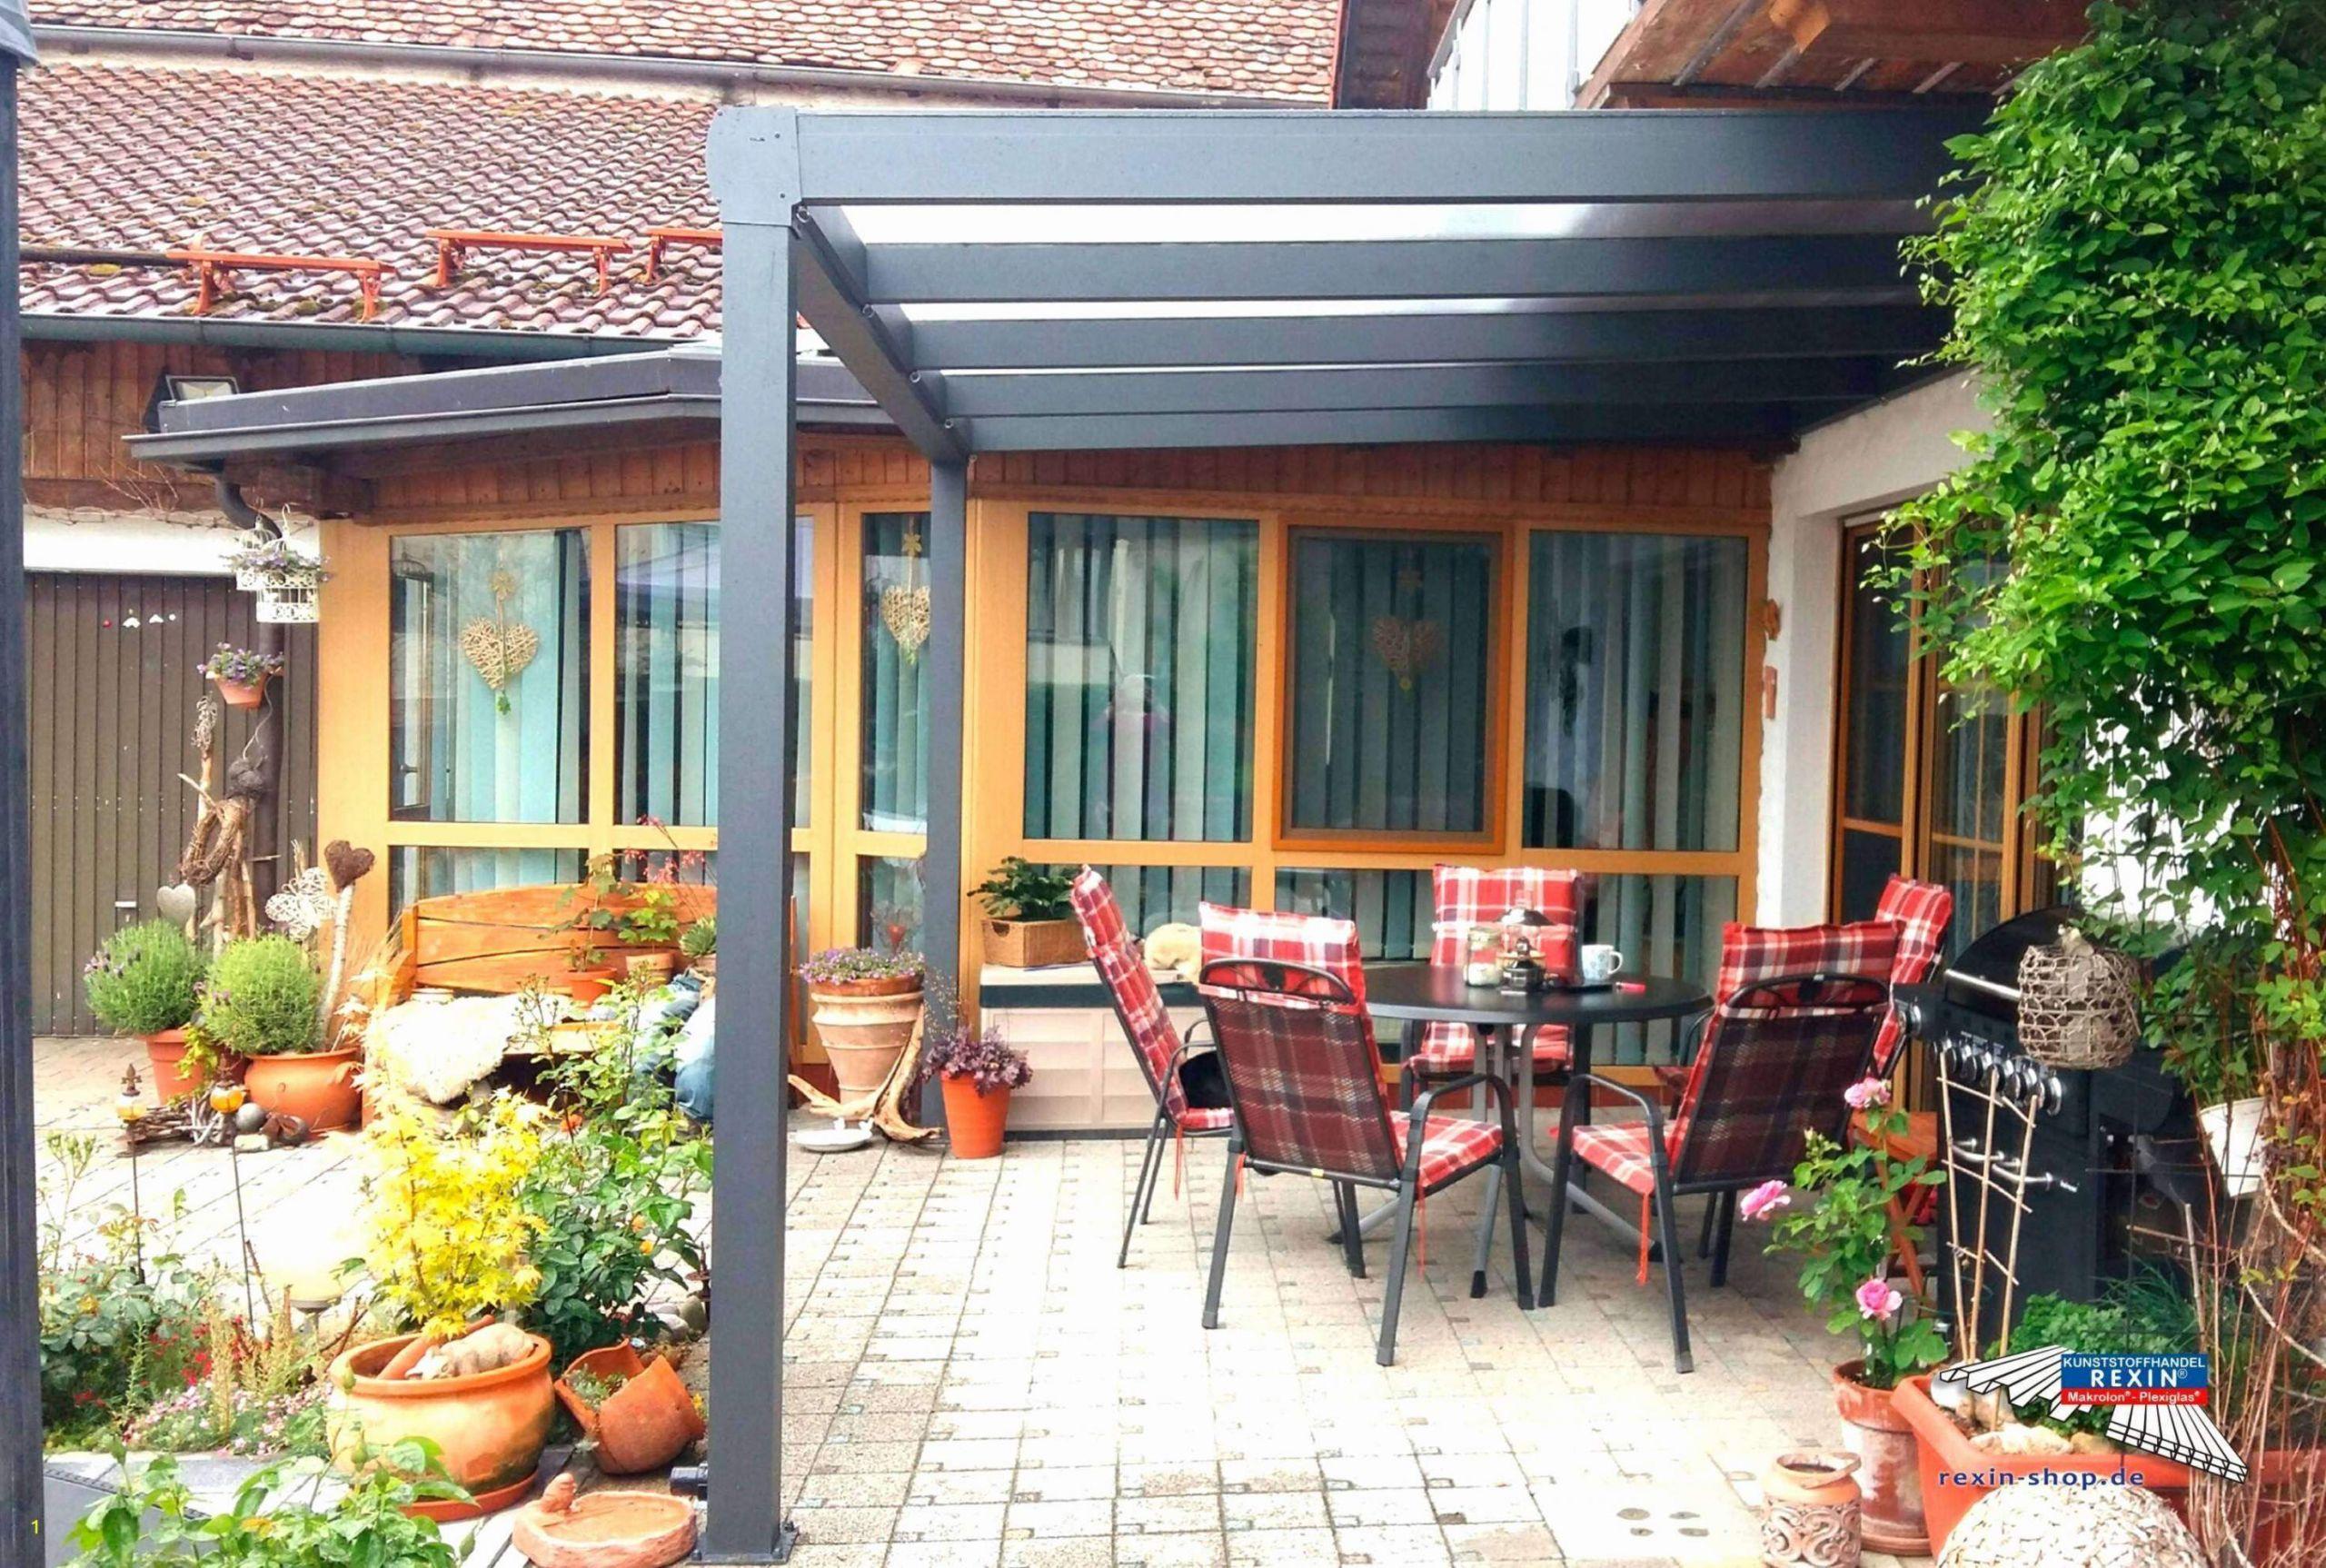 Deko Ideen Garten Genial Gartendeko Selber Machen — Temobardz Home Blog